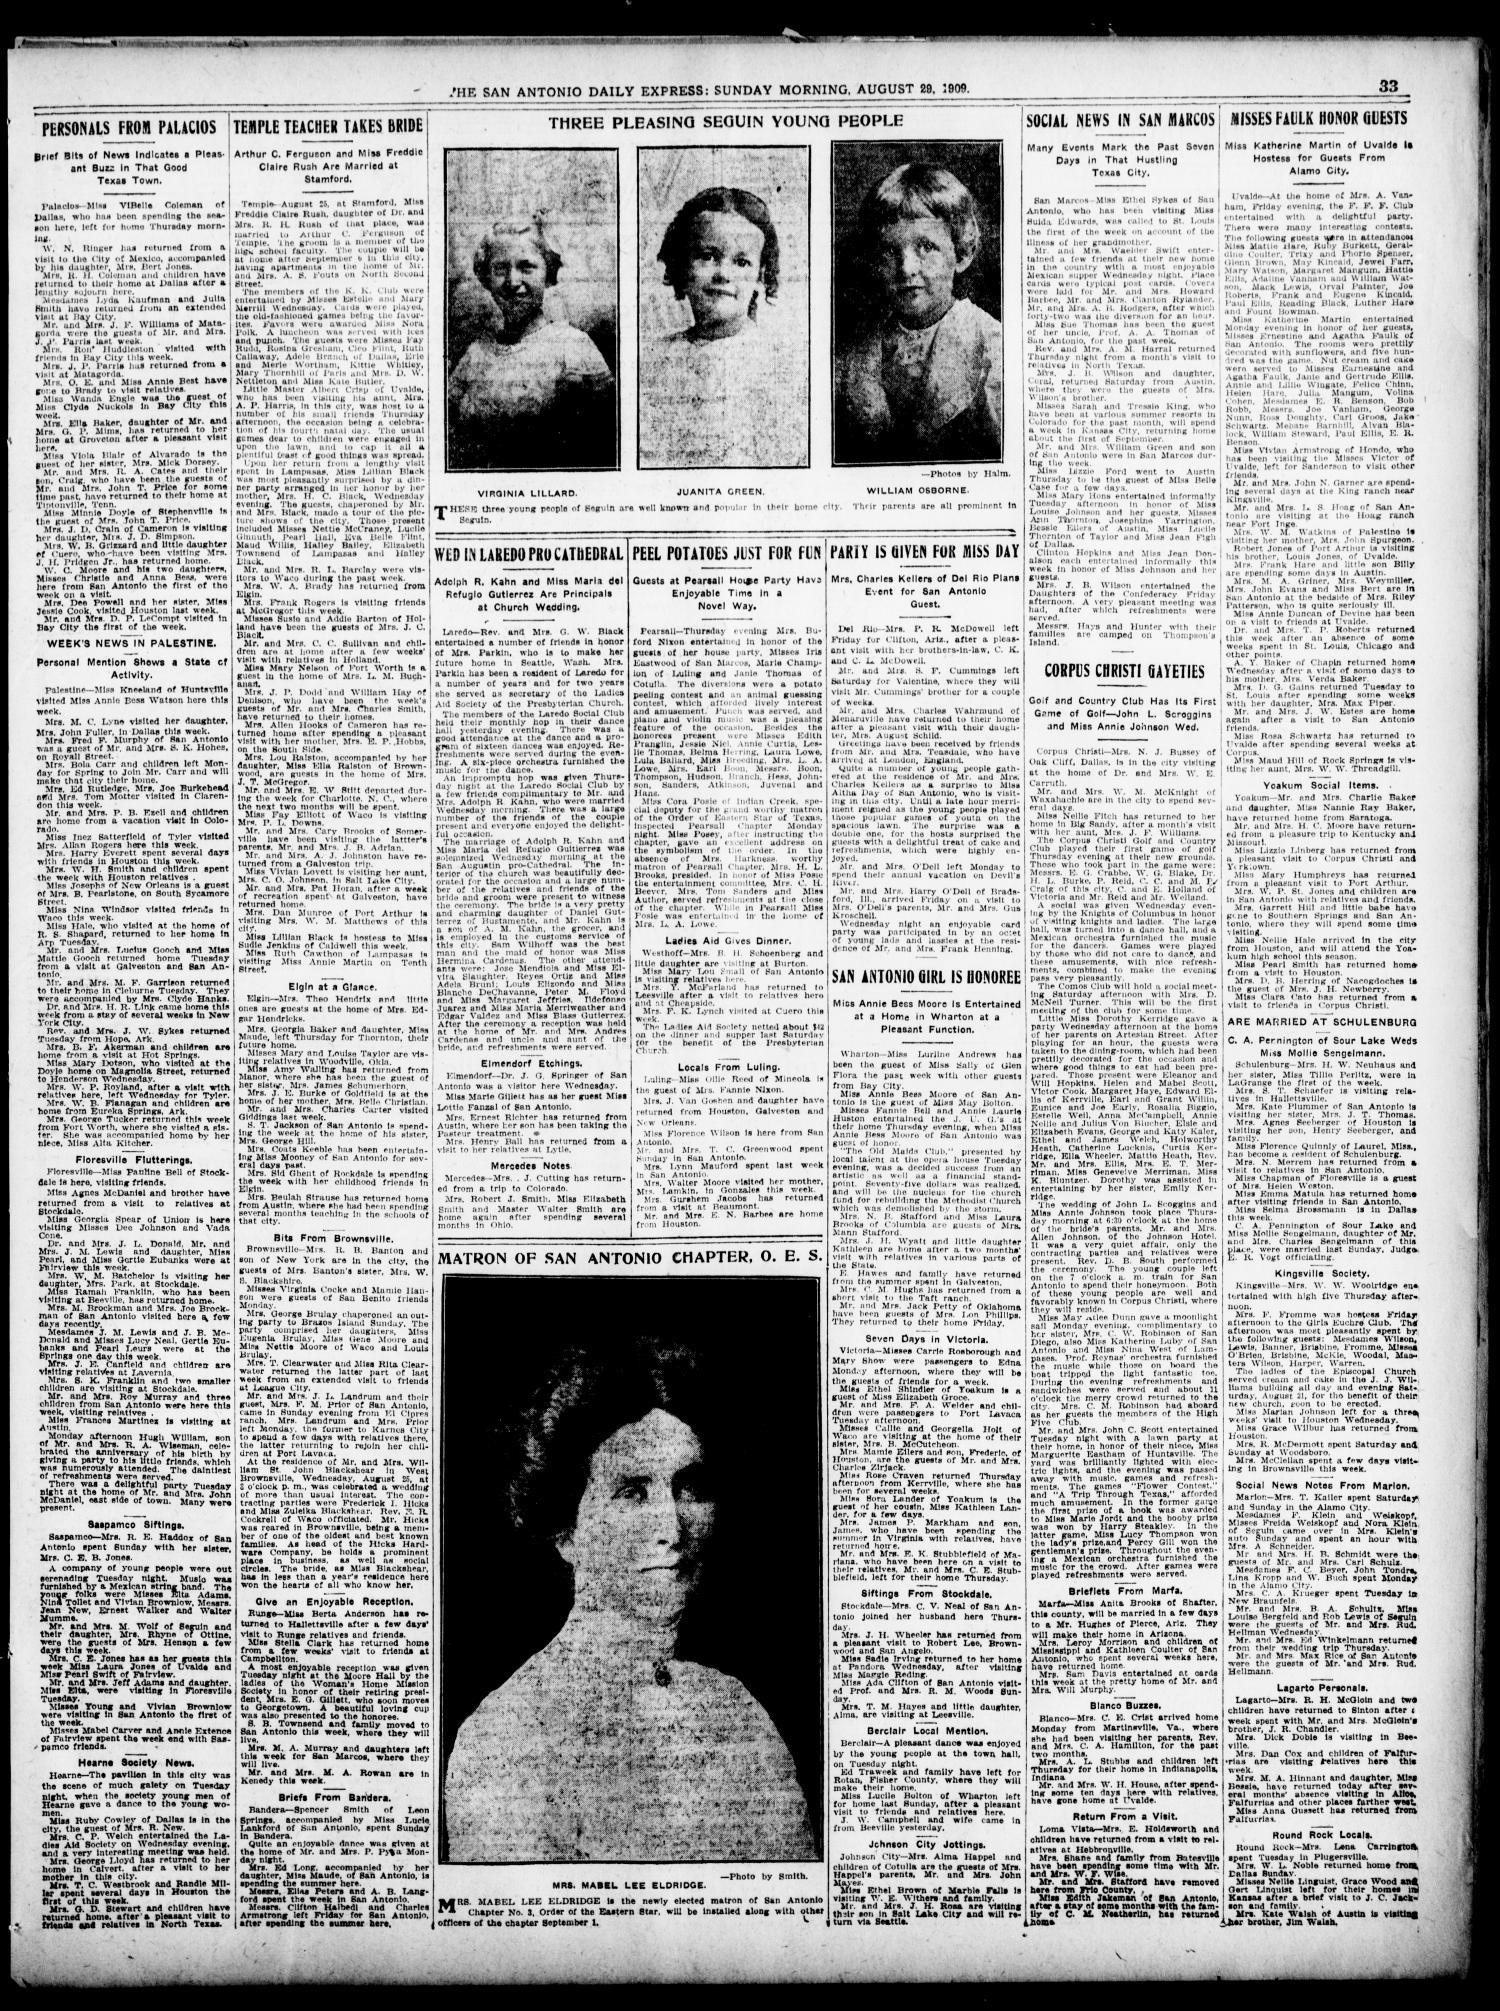 The Daily Express  (San Antonio, Tex ), Vol  44, No  241, Ed  1